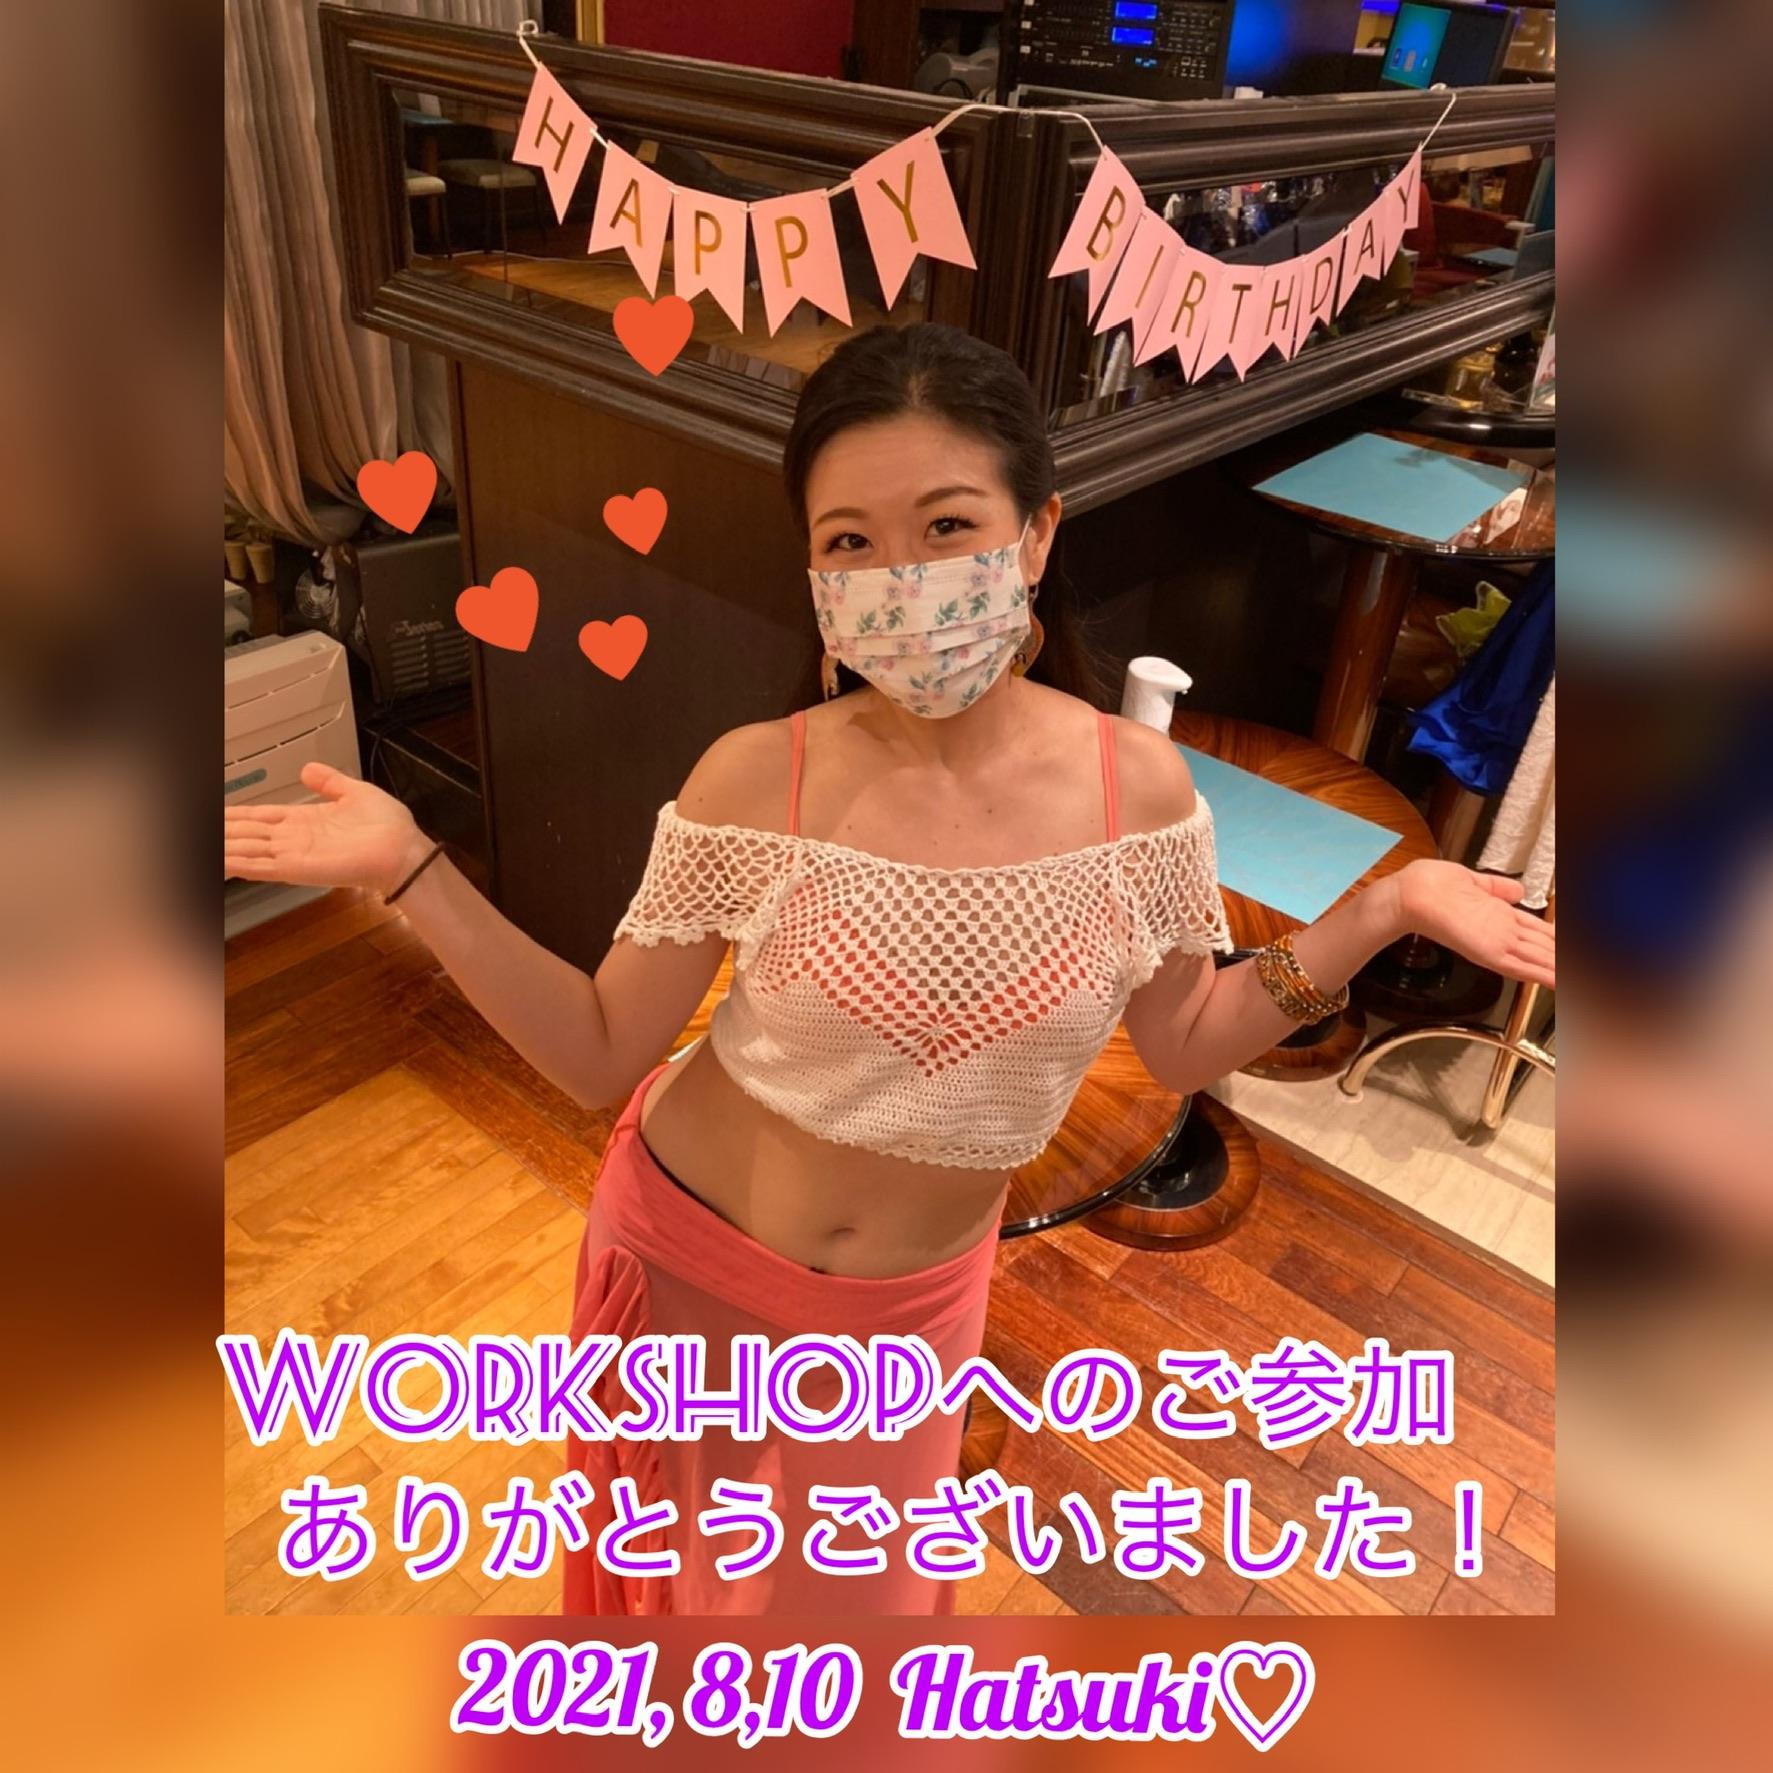 Hatsuki's Birthday Workshopにご参加いただきありがとうございました❣️